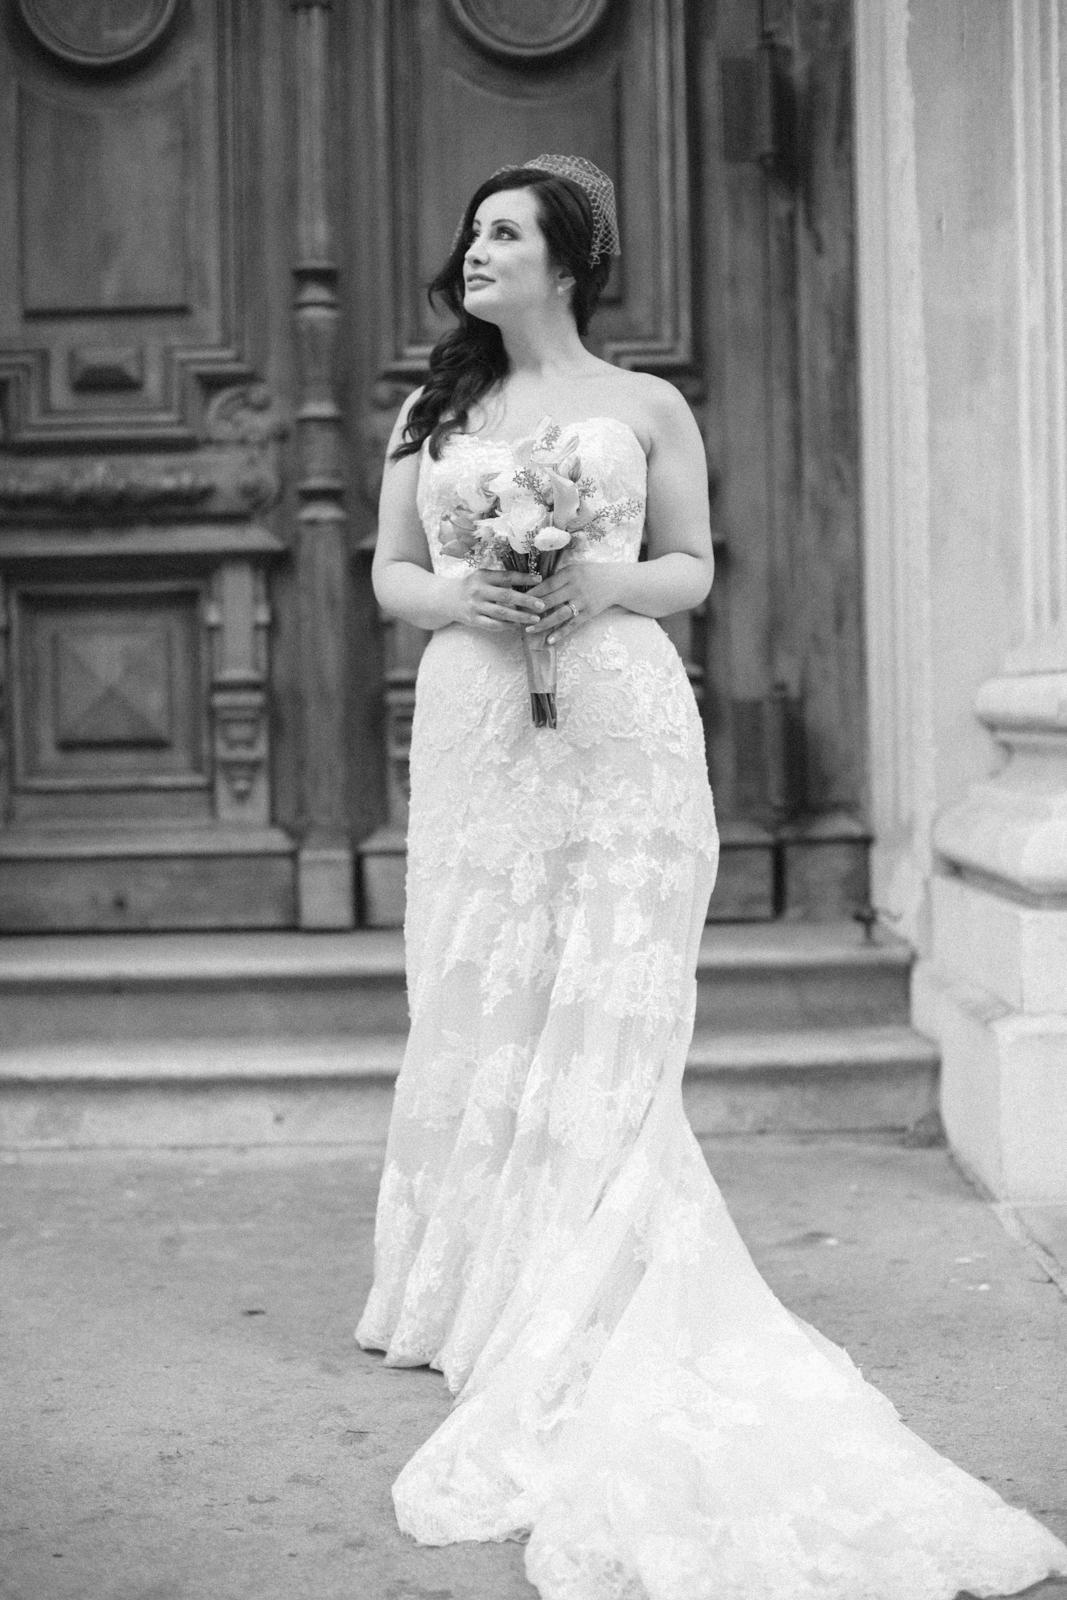 NYC Wedding Photography Lofts at Prince Brooklyn NYC Photographer Boris Zaretsky _B2C8086.jpg